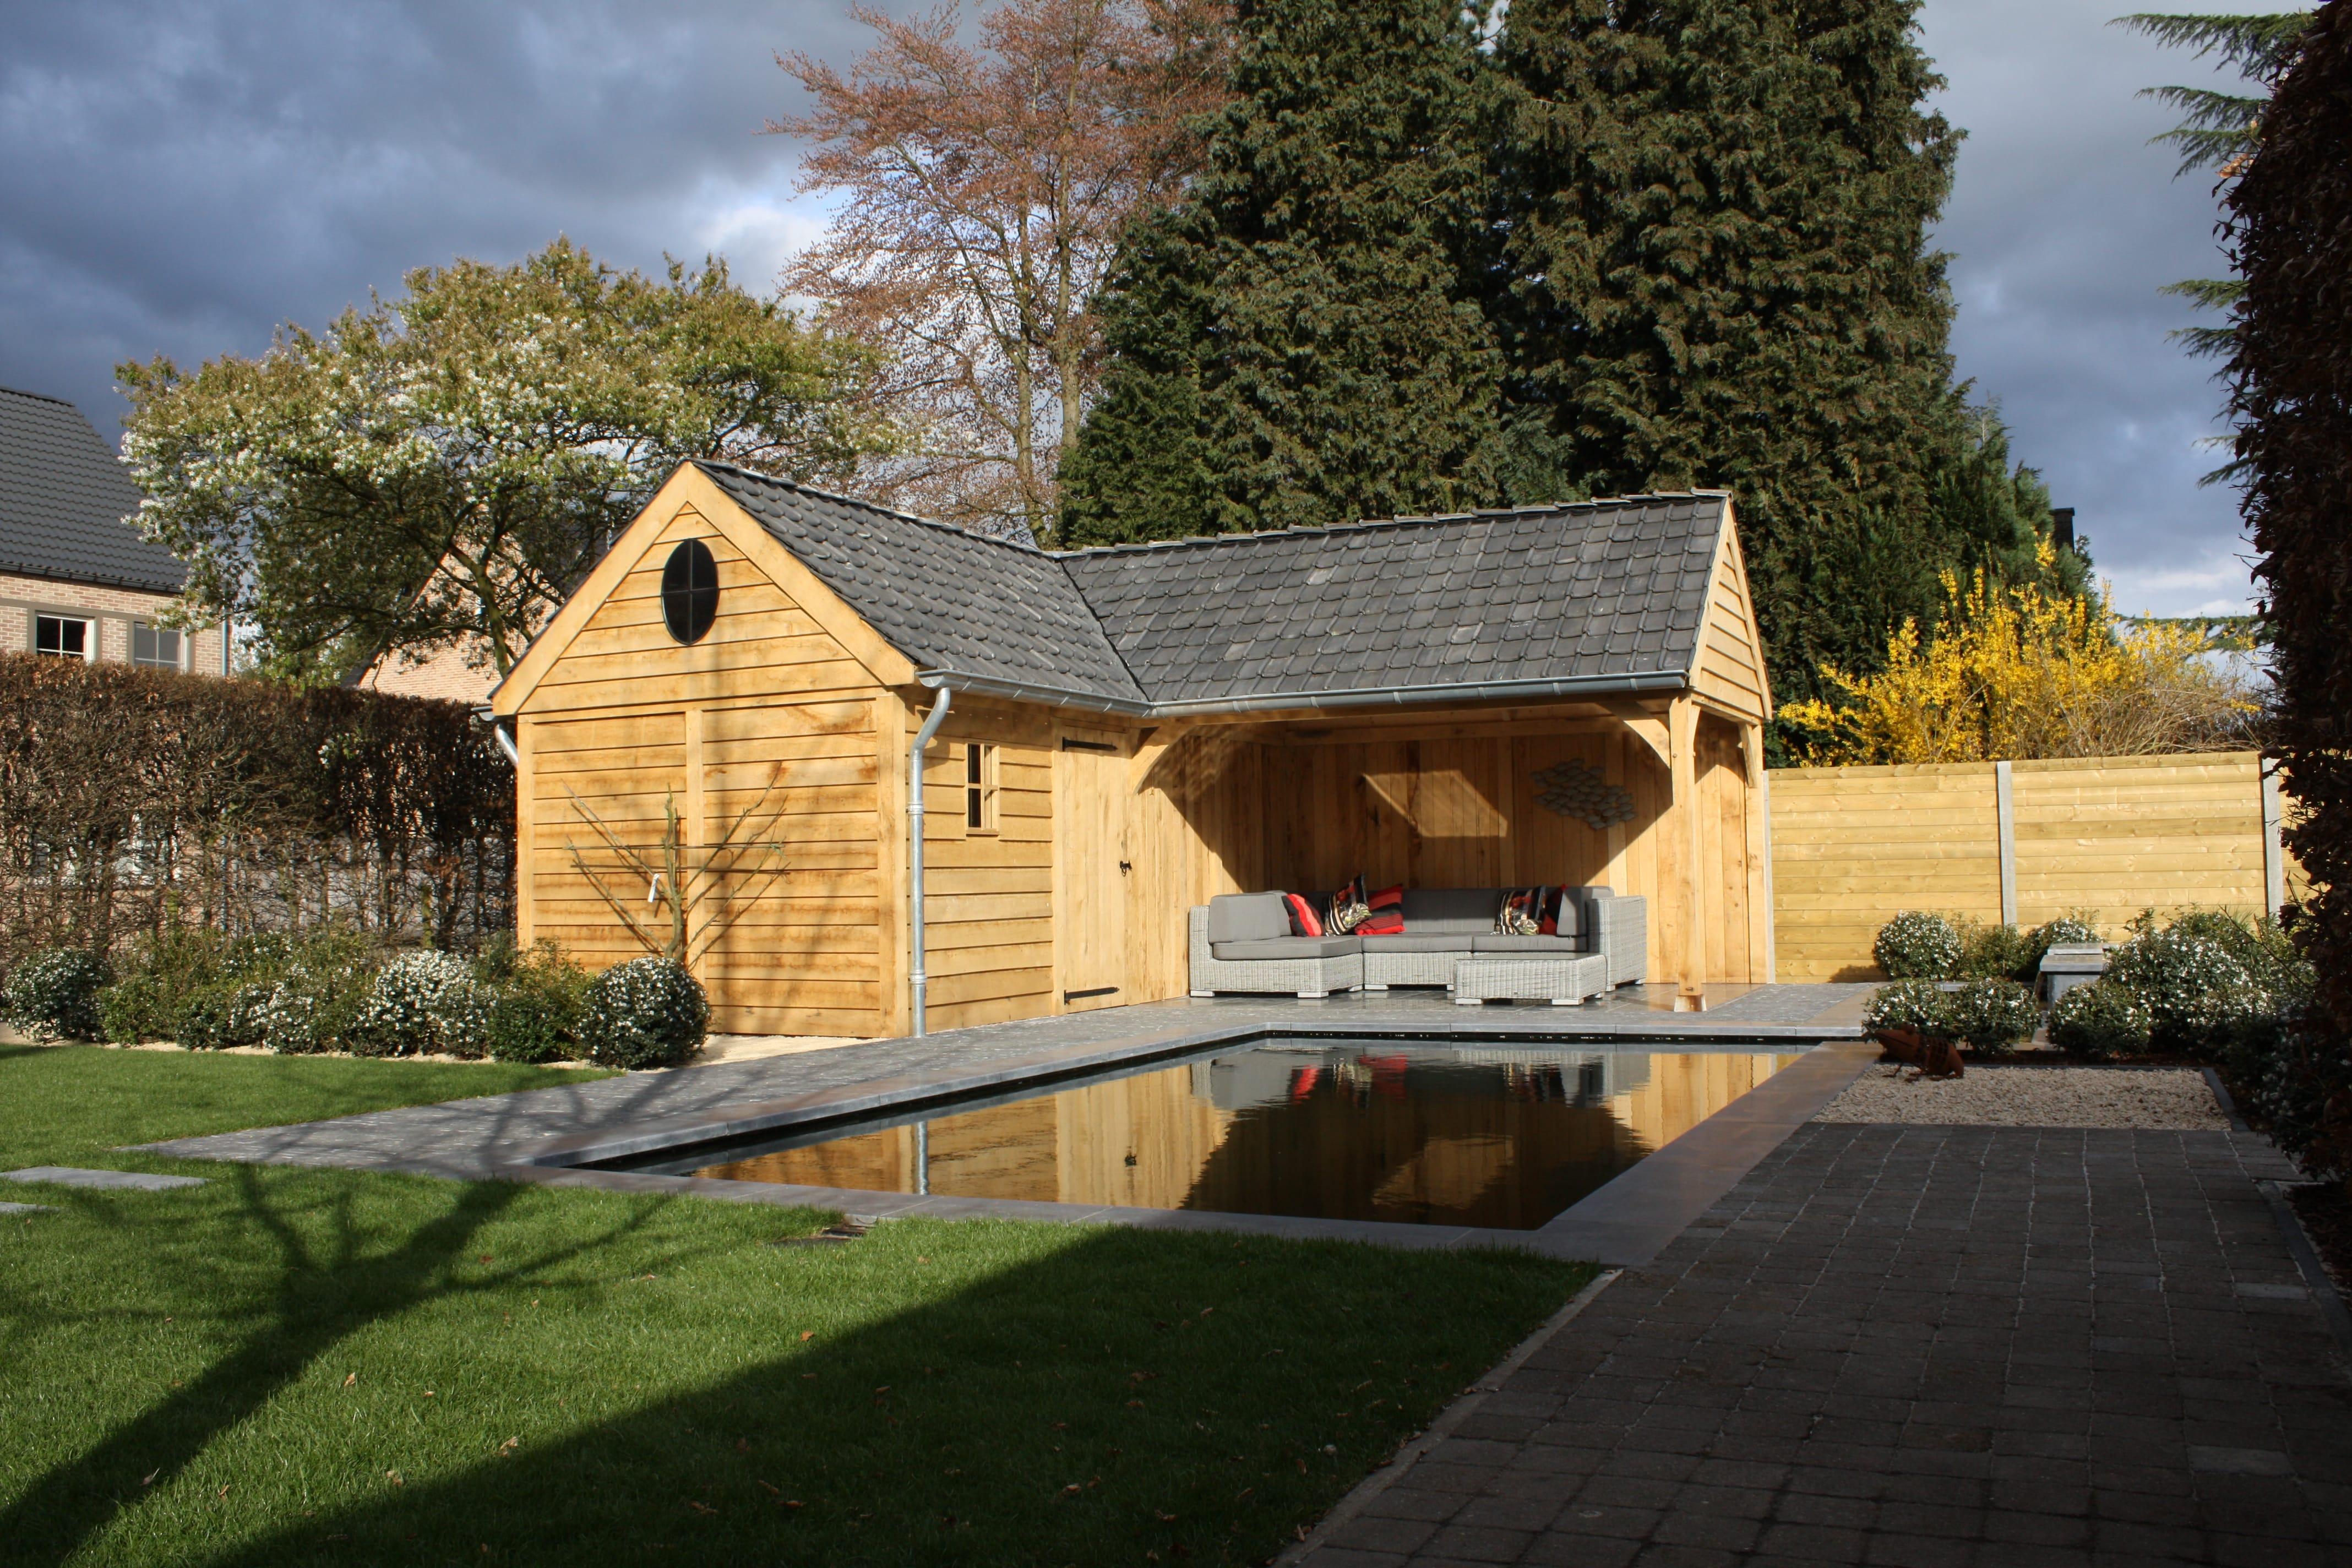 houten-poolhouse - Poolhouse